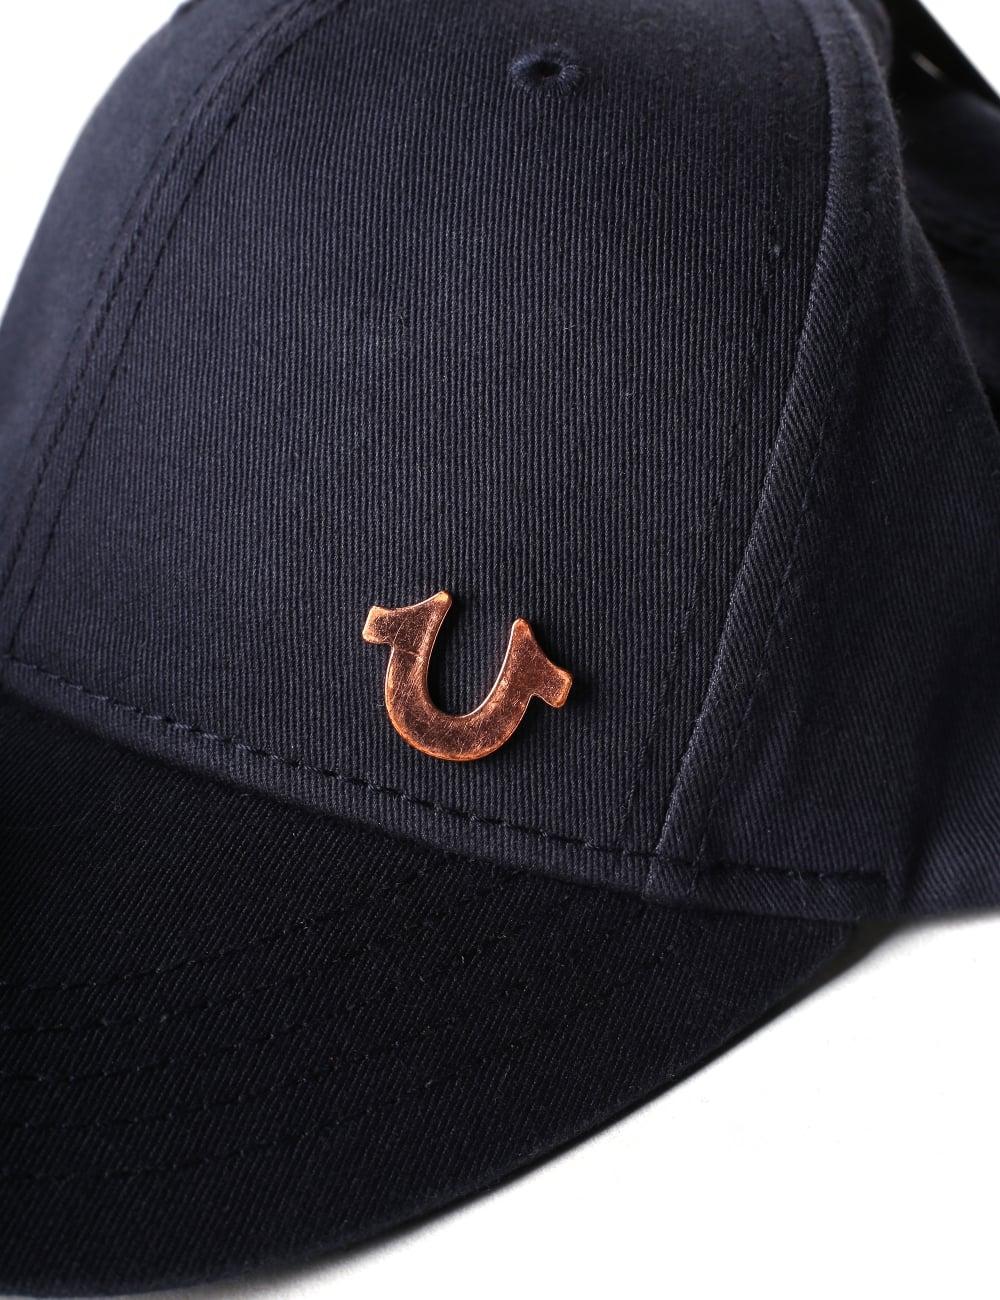 1b982942089 ... True Religion Core Logo Men s Baseball Cap. Tap image to zoom. Core Logo  Men  039 s Baseball Cap